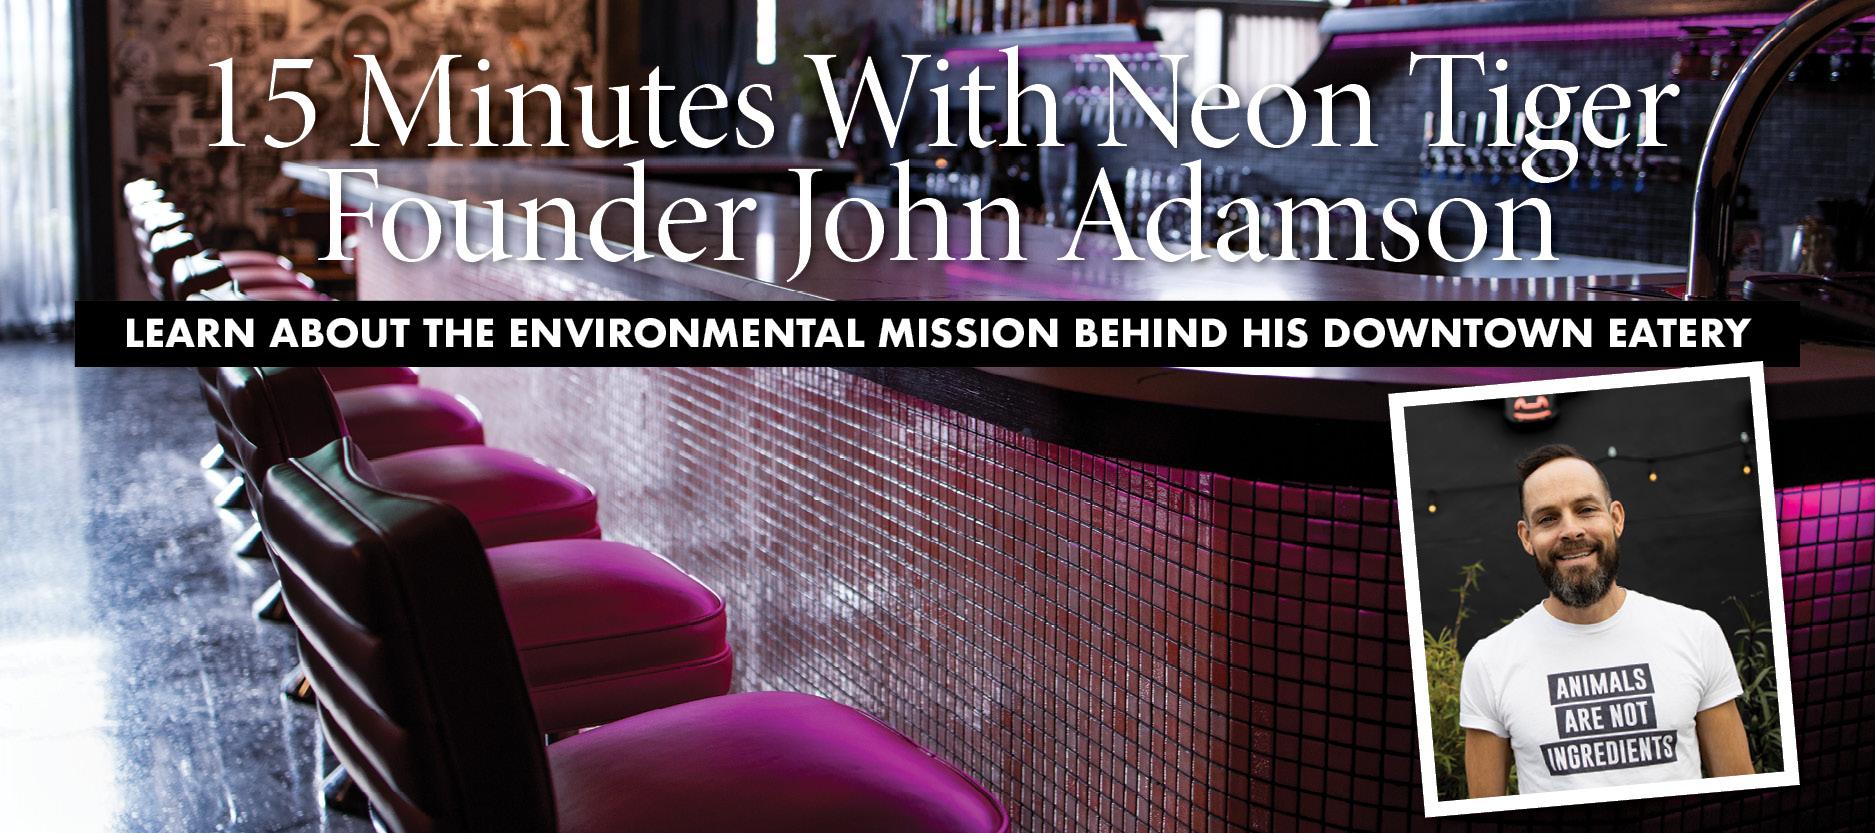 15 Minutes With John Adamson, Neon Tiger